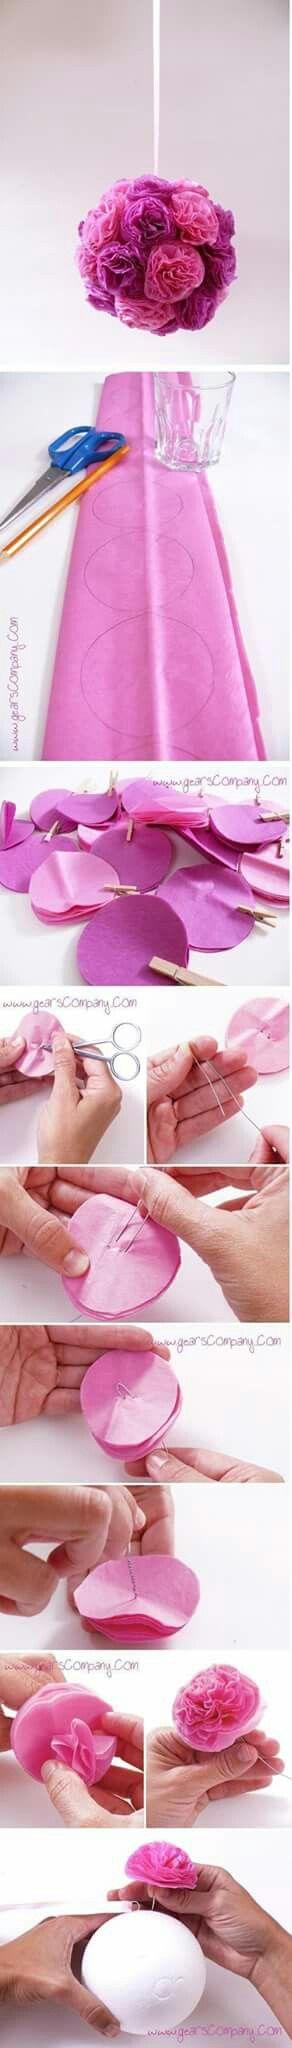 Decorazione coi fiori di carta